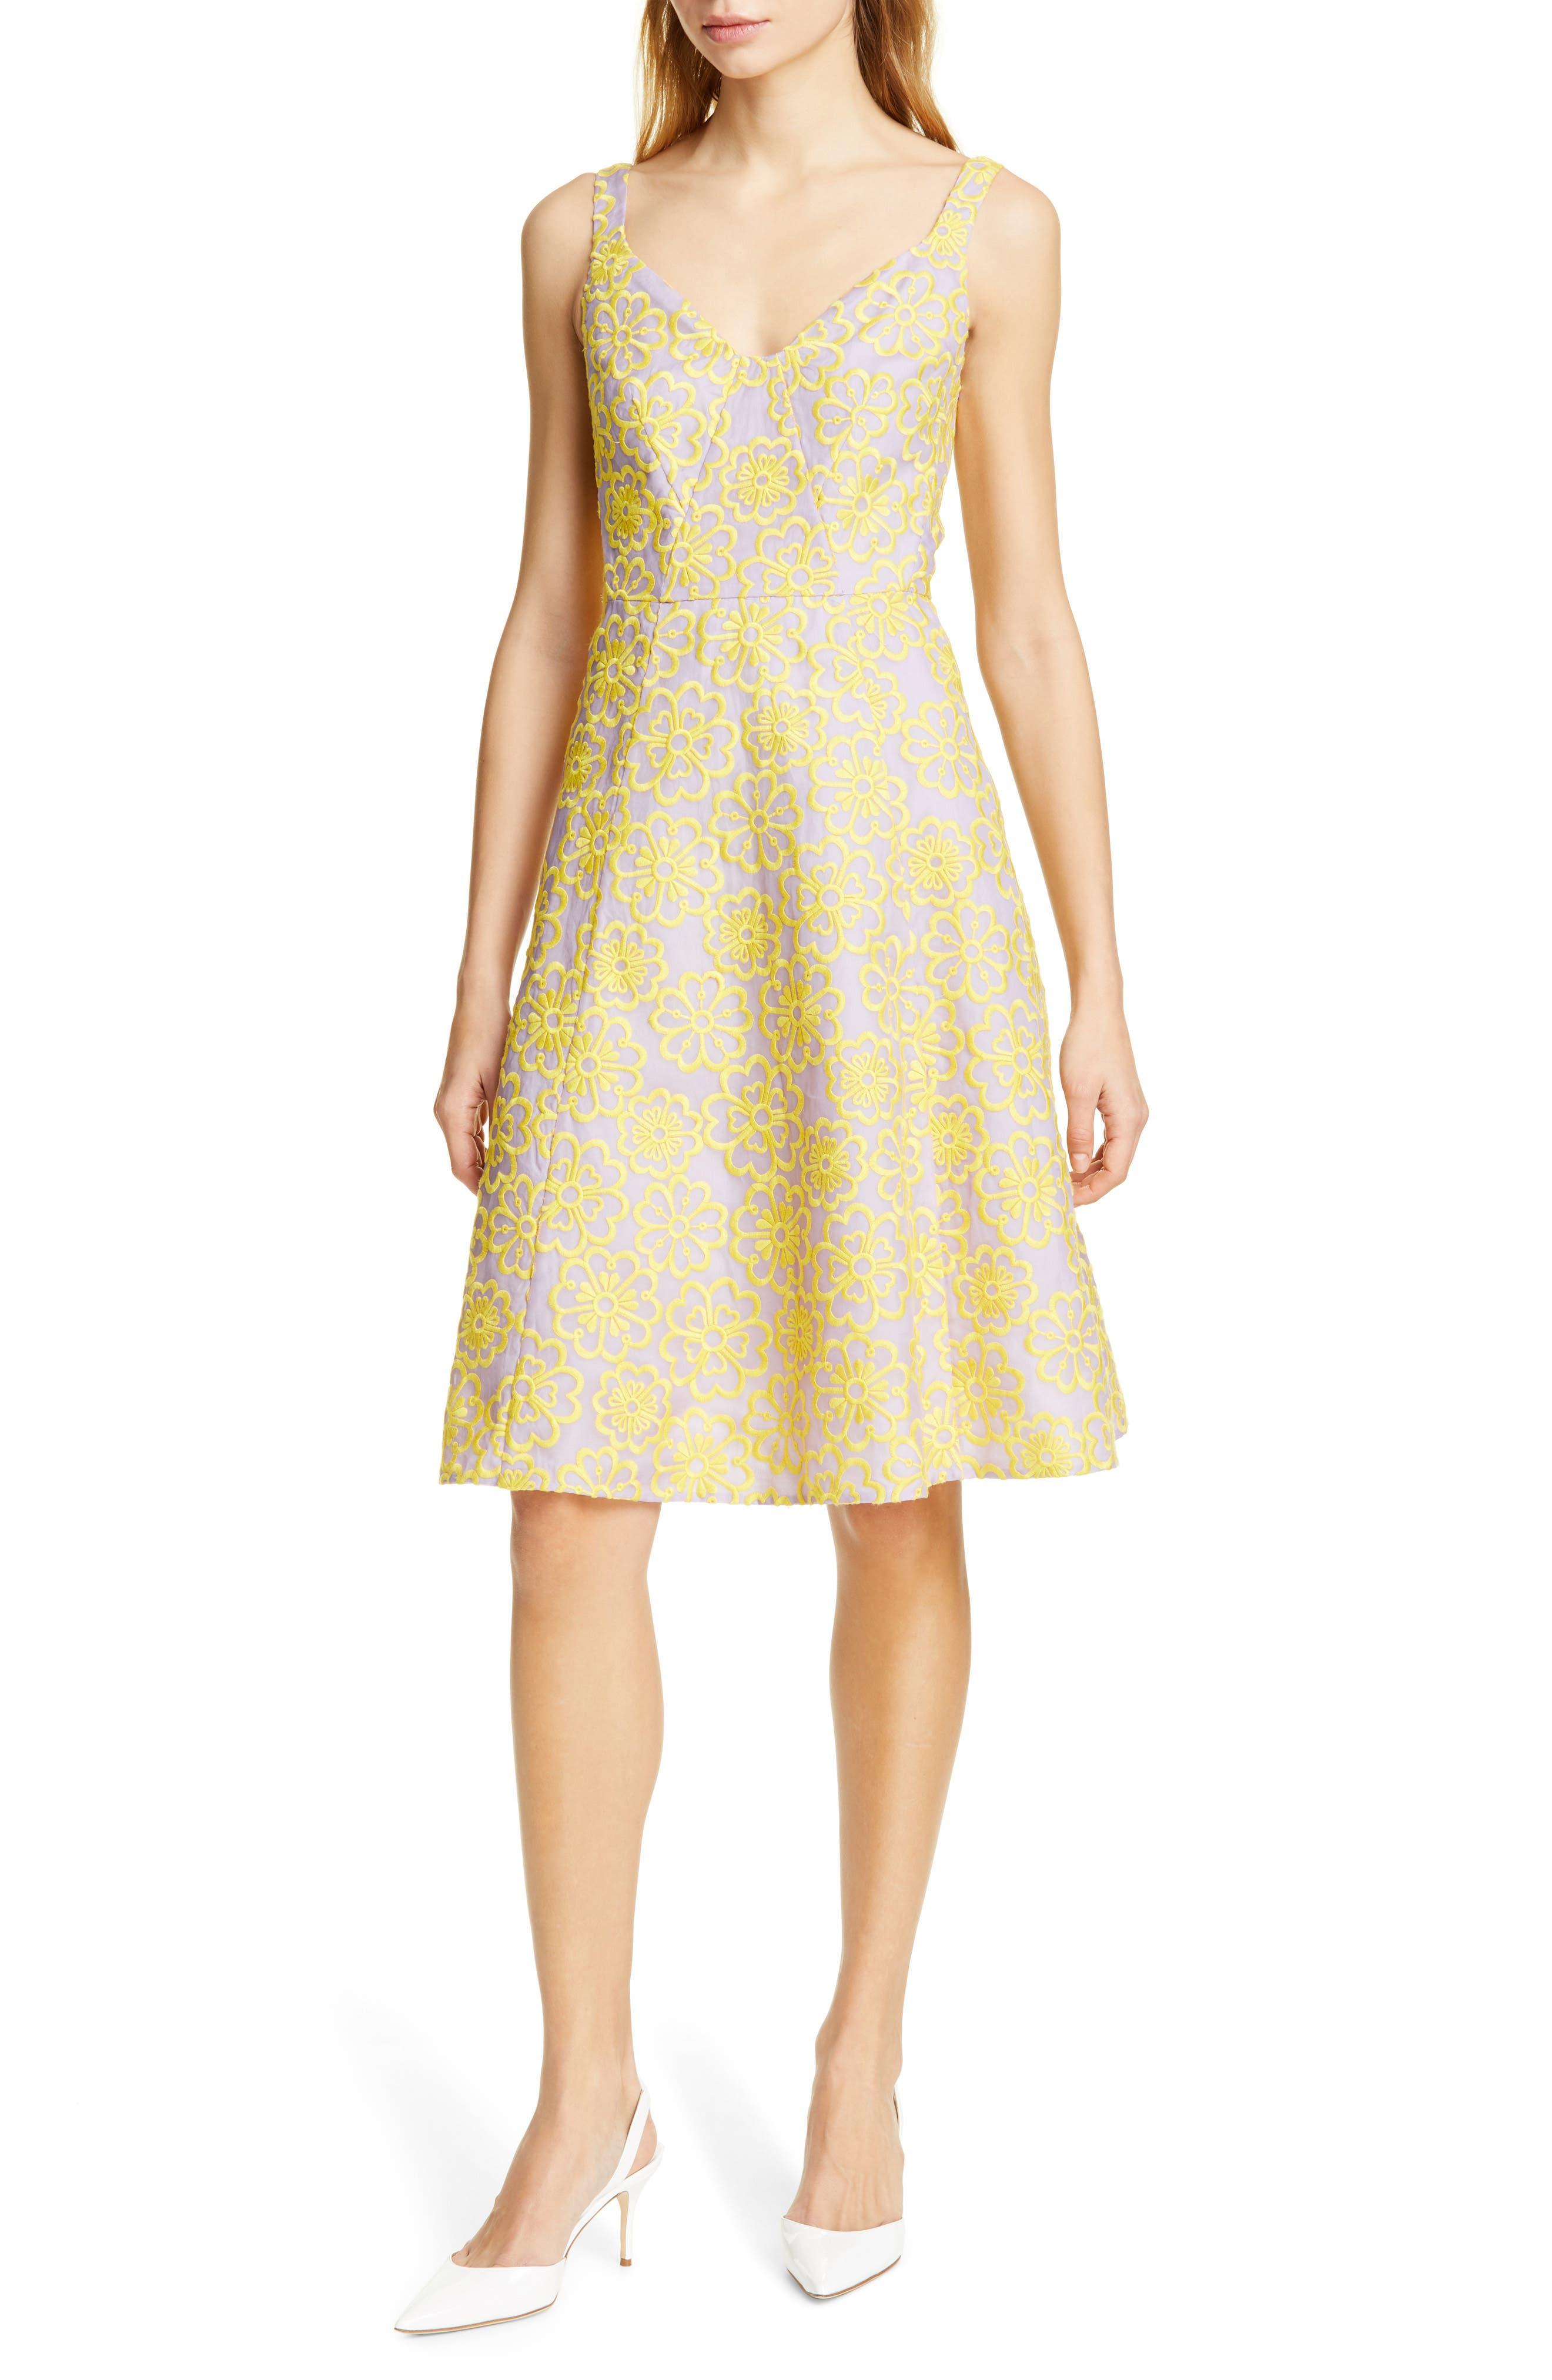 Kate Spade New York Floral Silk Sundress, Yellow